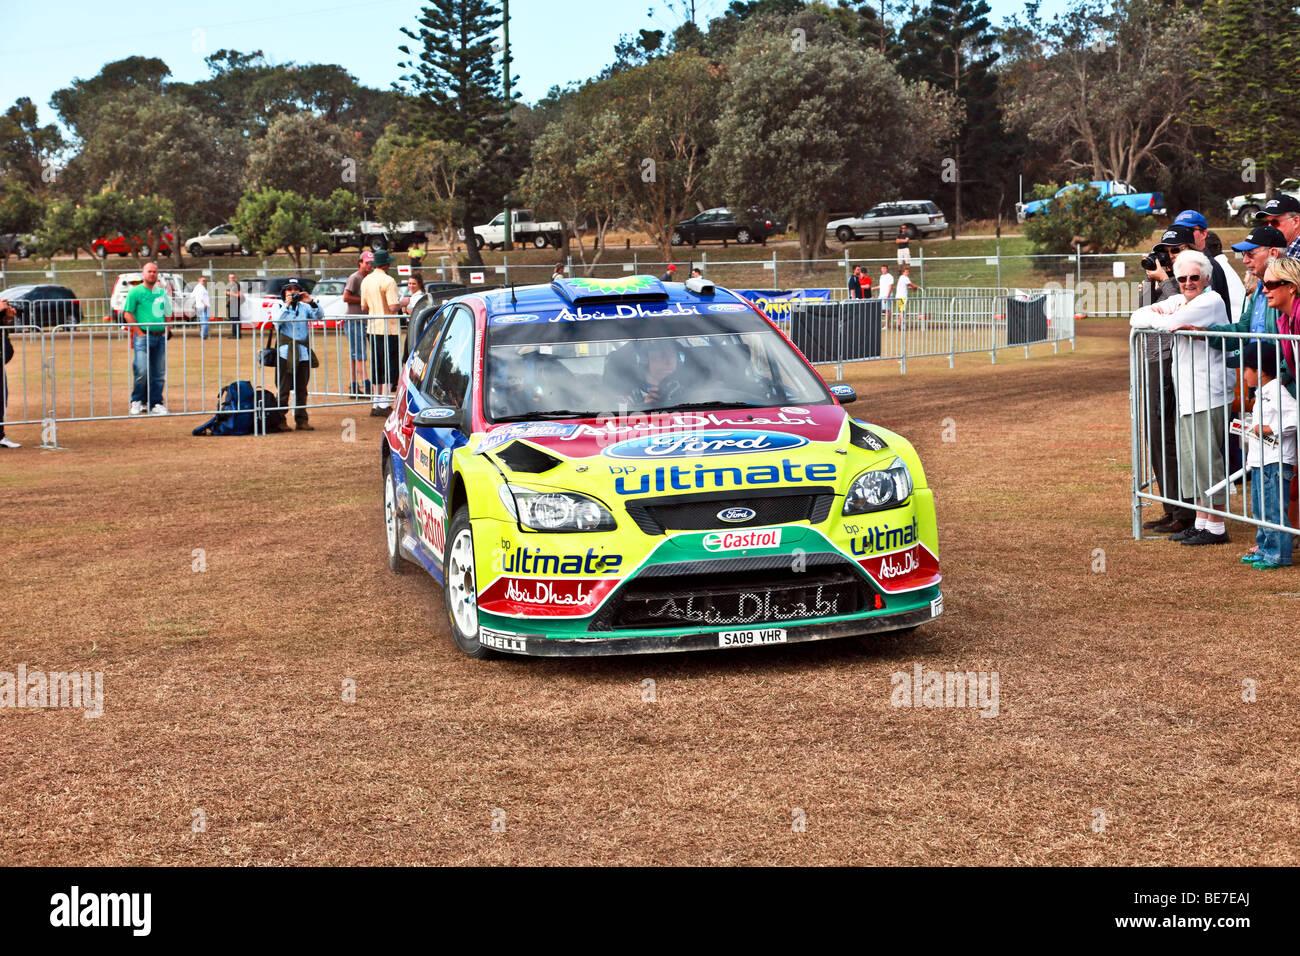 Motorsport/Rallye Australien 2009/WRC Rallye-Auto Einzug in seinen Boxenstopp Stockbild